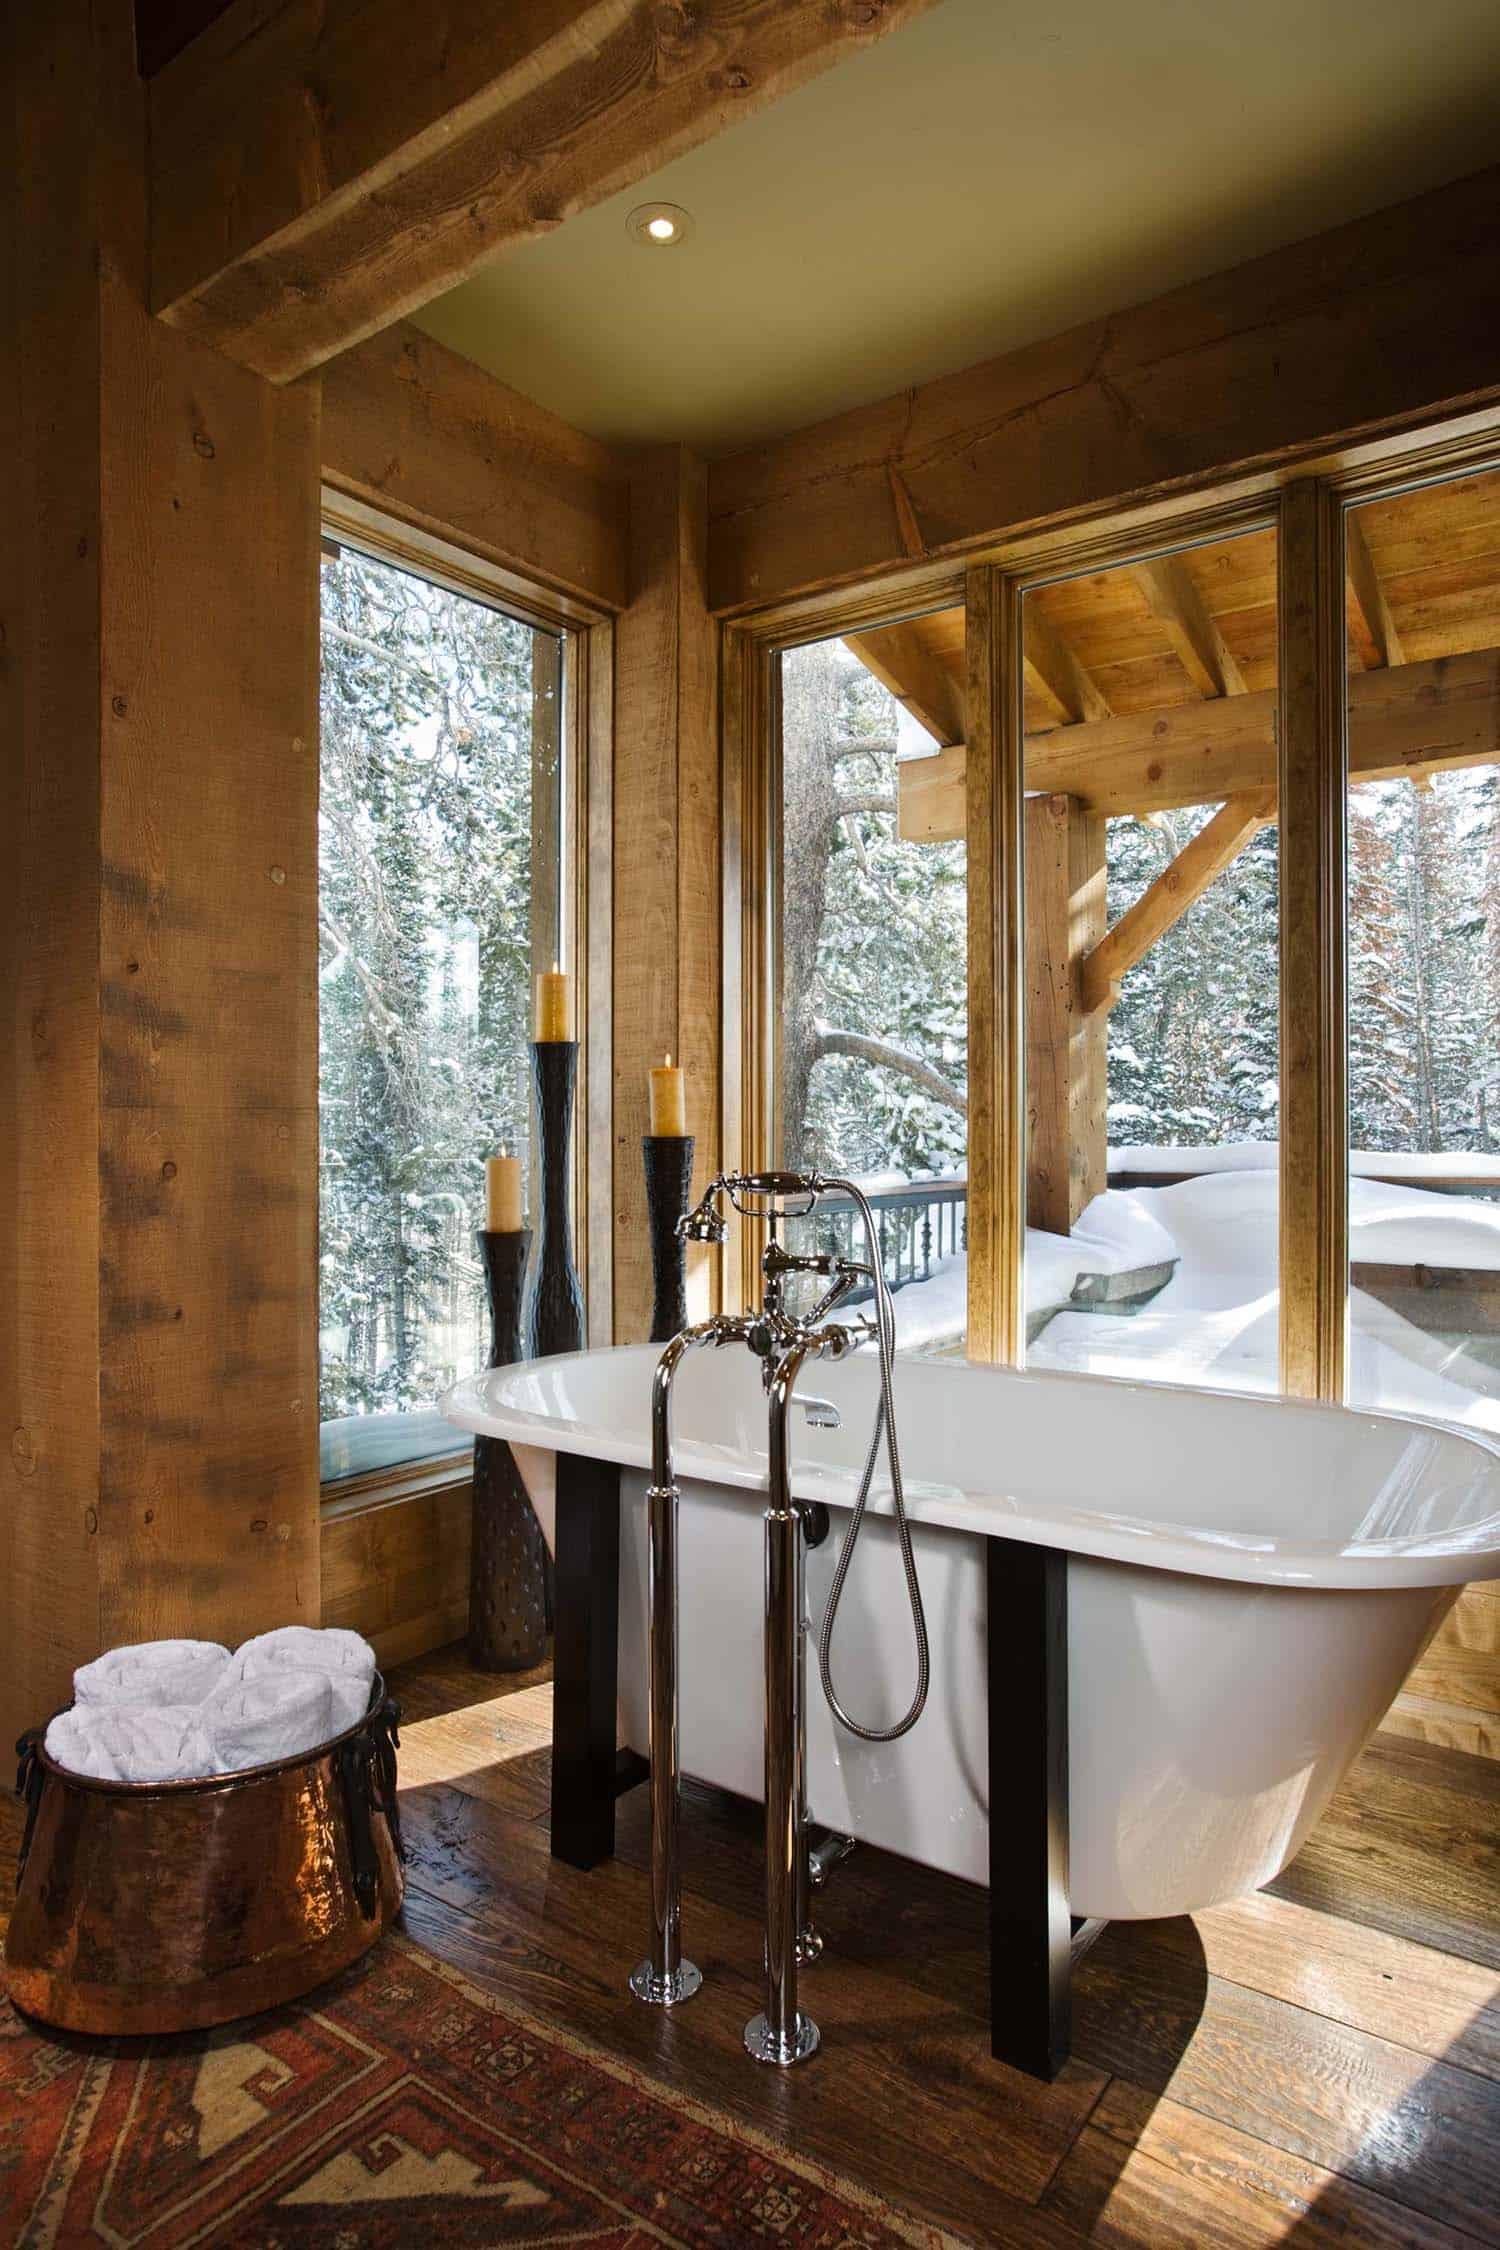 Modern-Rustic Mountain Home-Locati Architects-20-1 Kindesign